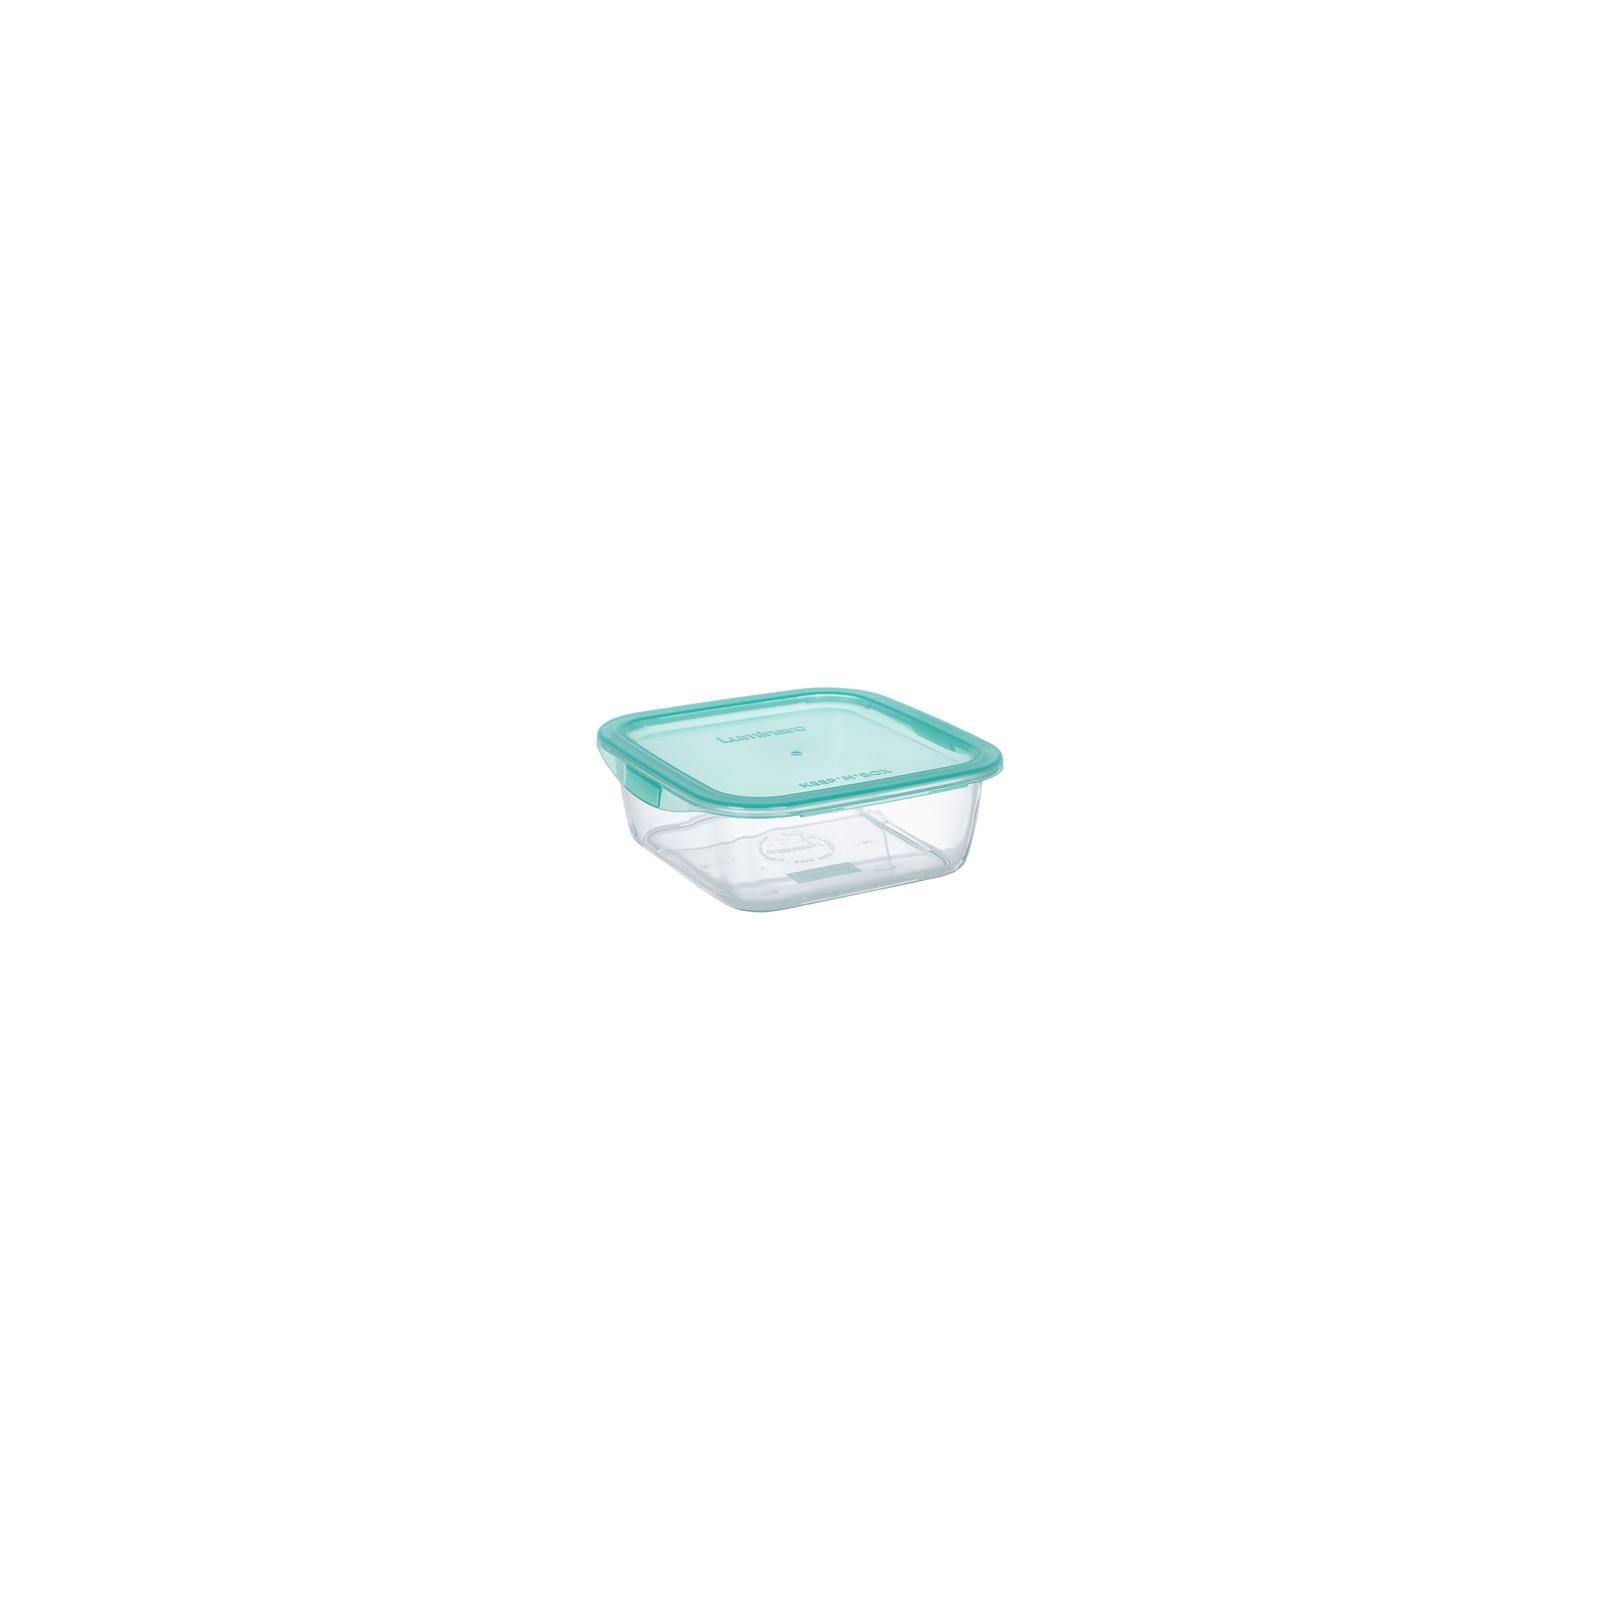 Пищевой контейнер Luminarc Keep'n Box Lagoon квадр. 1220 мл (P5520)